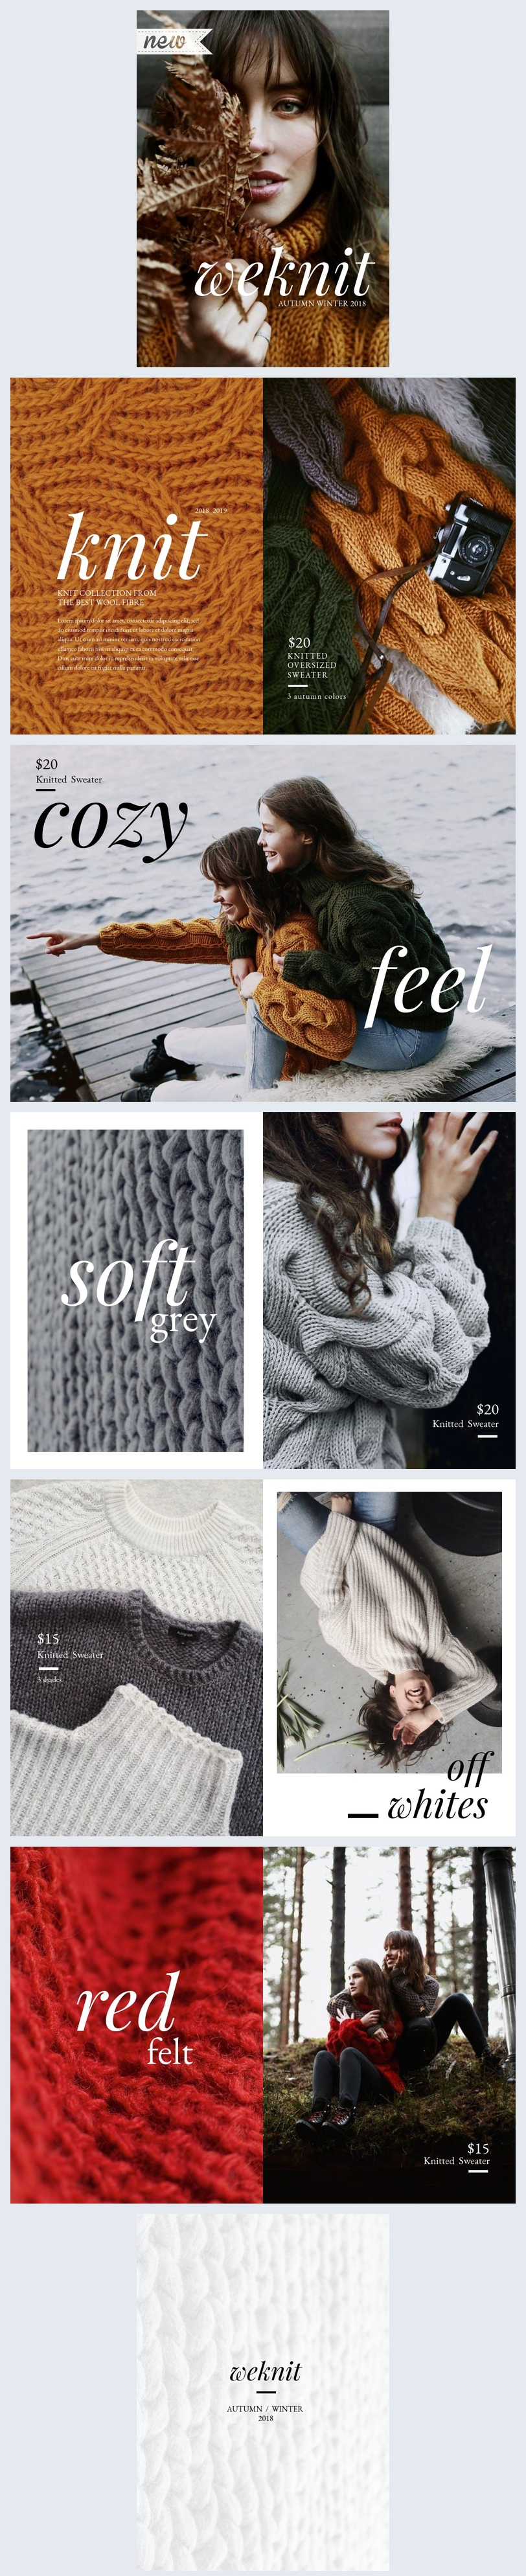 Modern Fashion Lookbook Template & Design